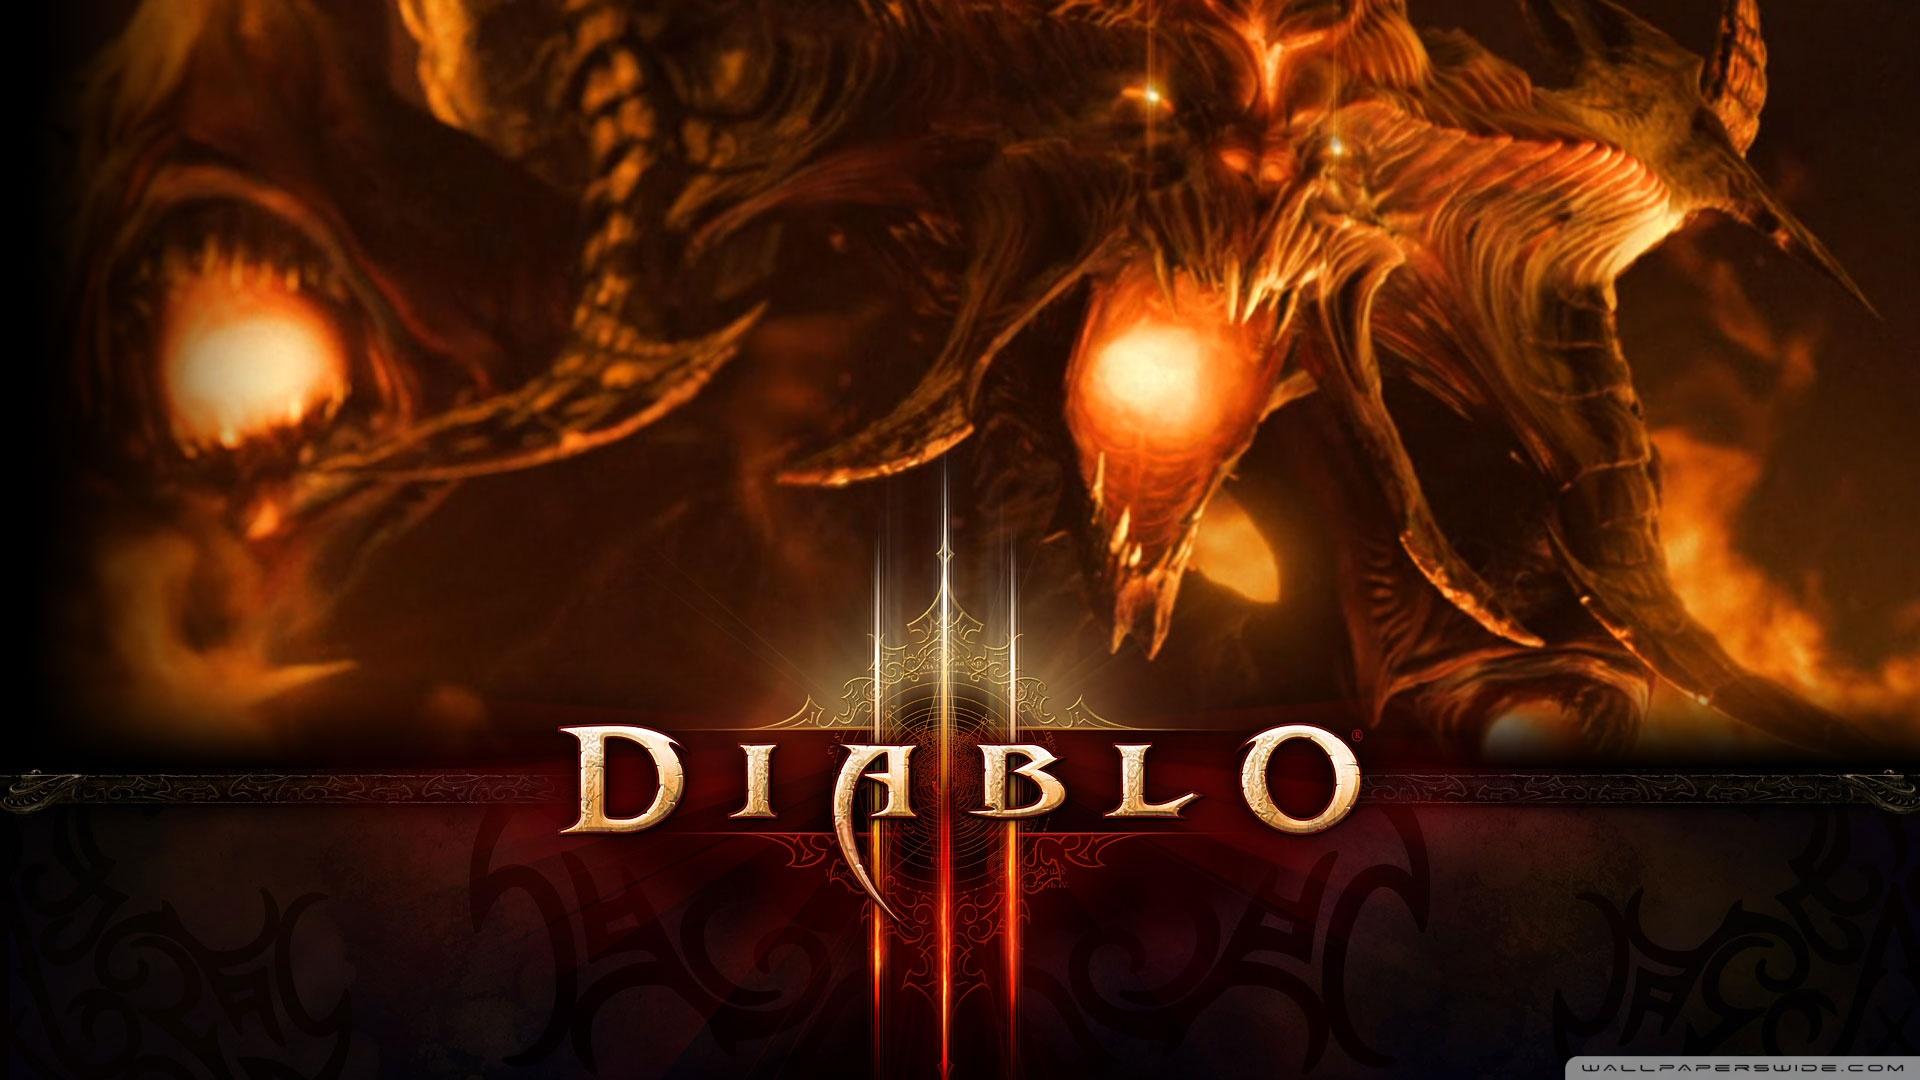 Diablo 3 Wallpaper 1920x1080: Diablo III Cinematic Shows Diablo Himself Rising From The